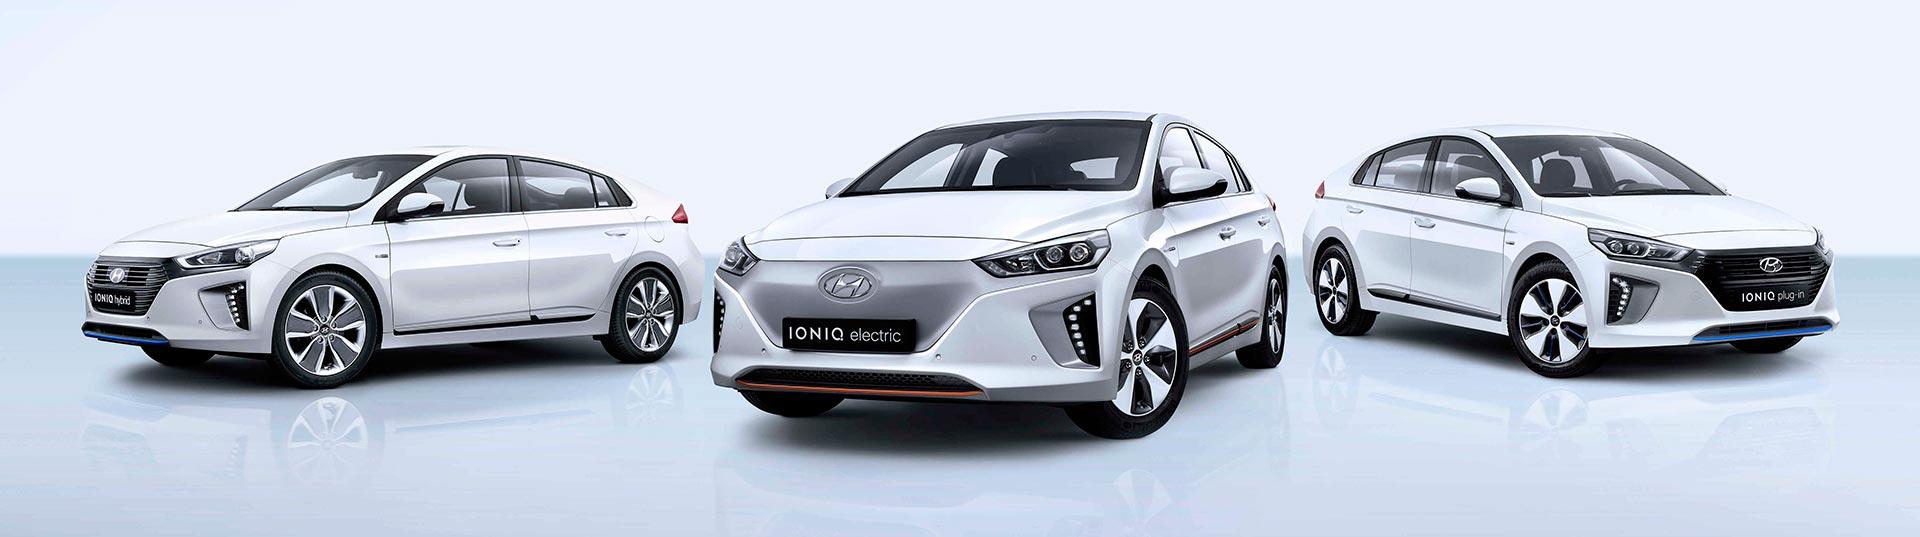 Hyundai Ioniq recebe prémio Good Design 2016